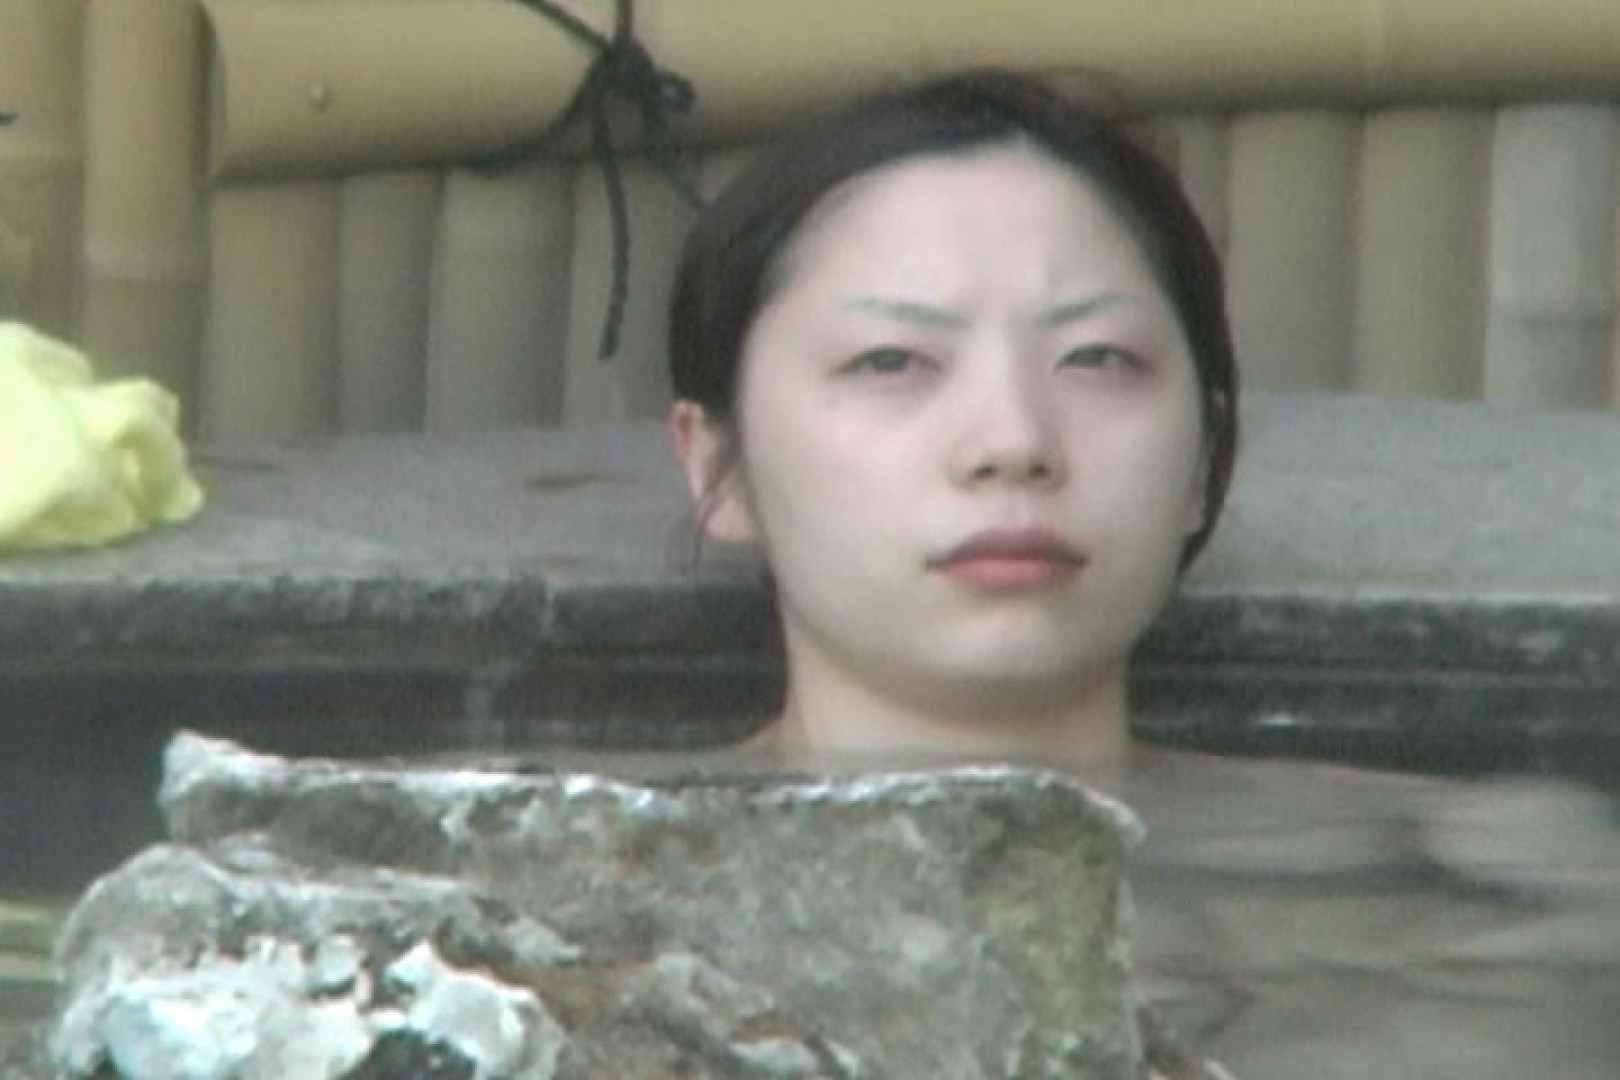 Aquaな露天風呂Vol.596 盗撮シリーズ | 露天風呂編  113PIX 63